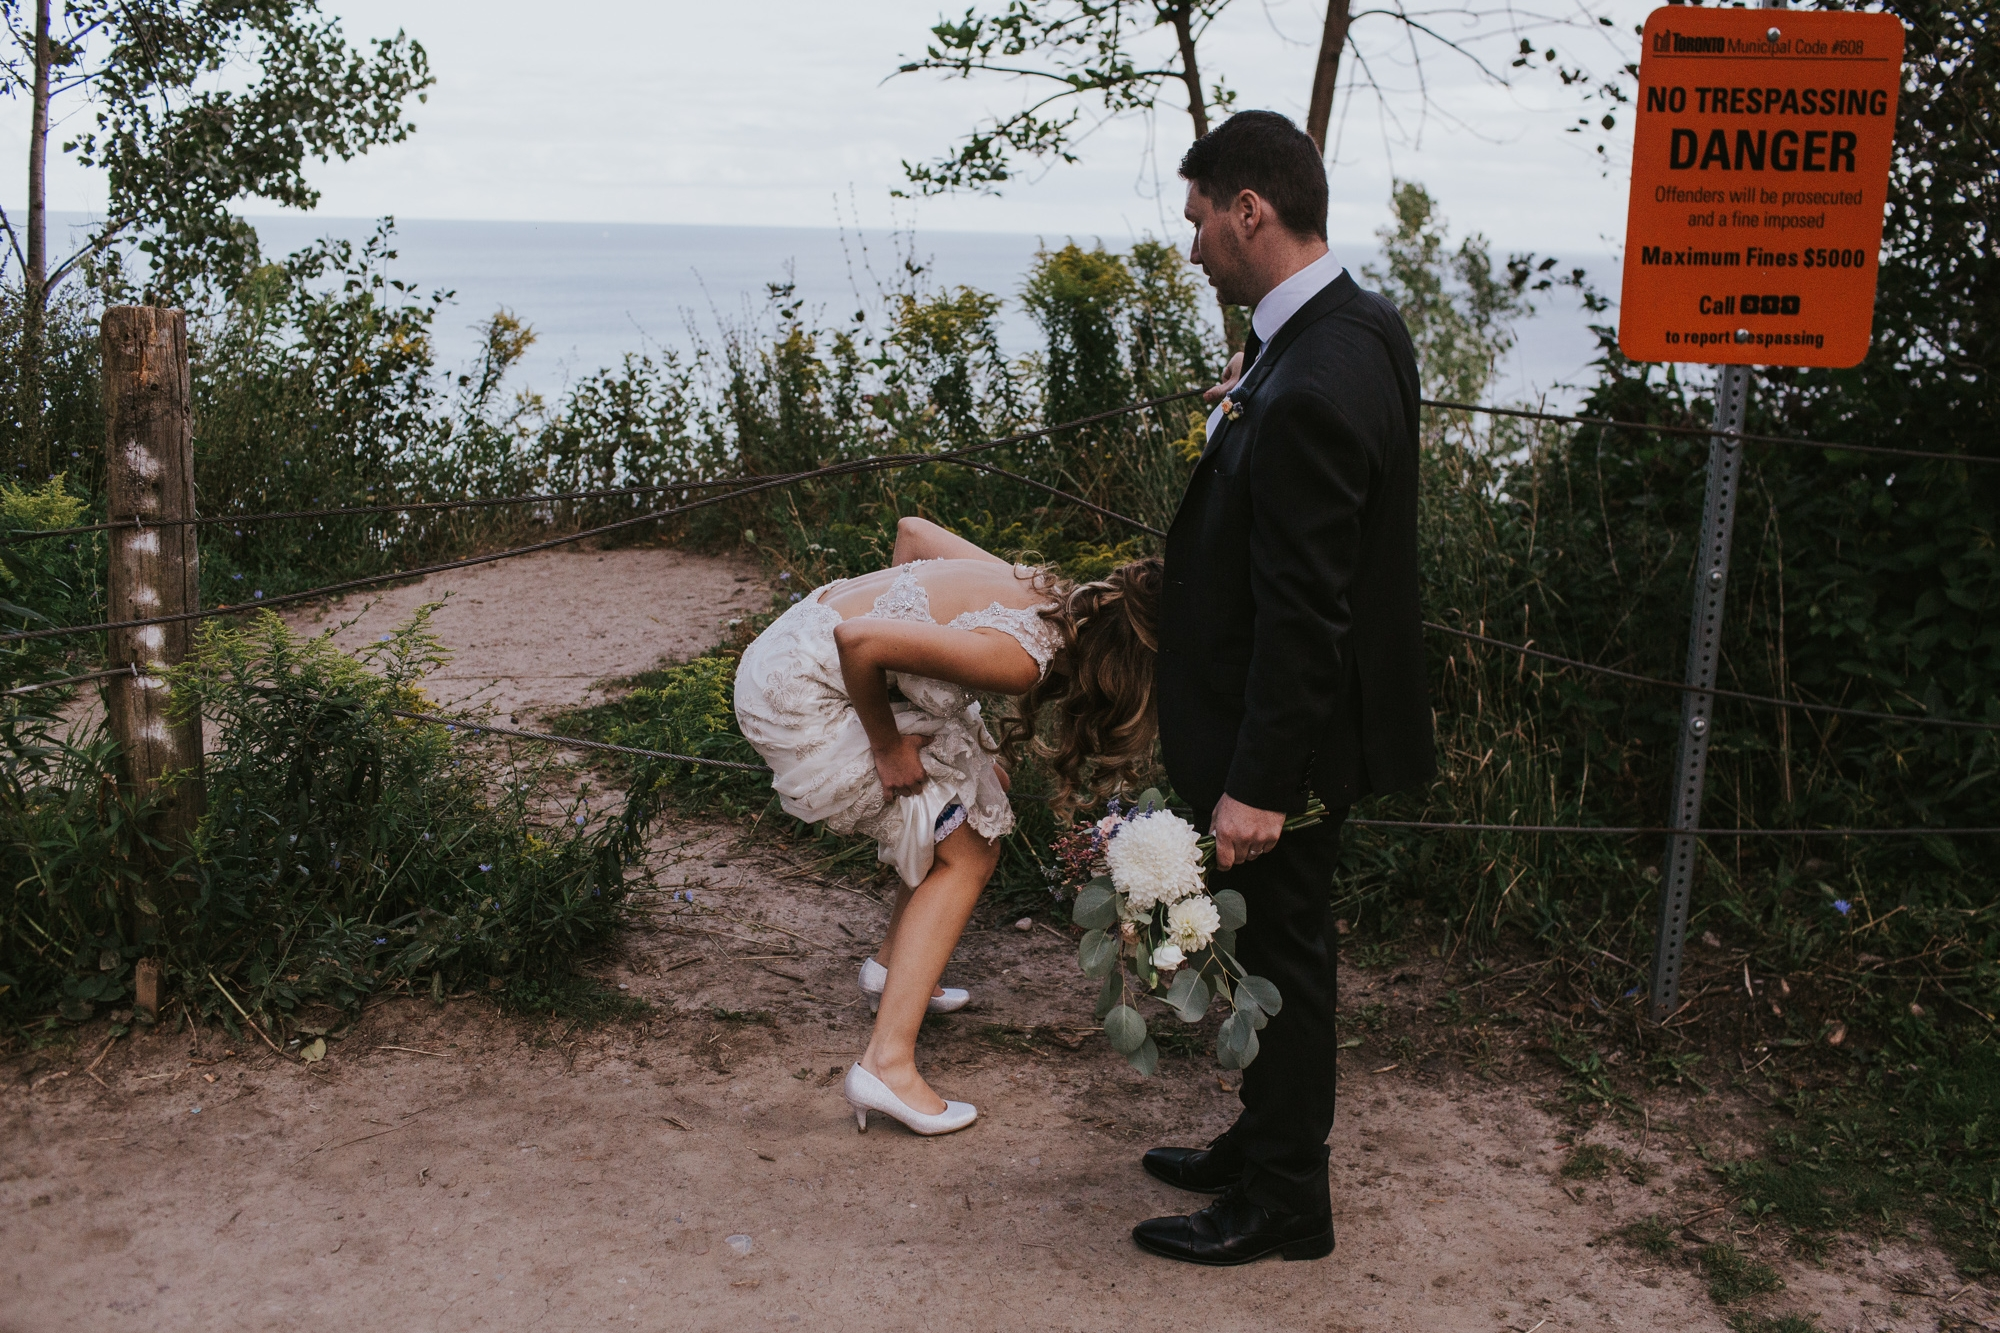 Guild-inn-toronto-wedding-photography-230.jpg